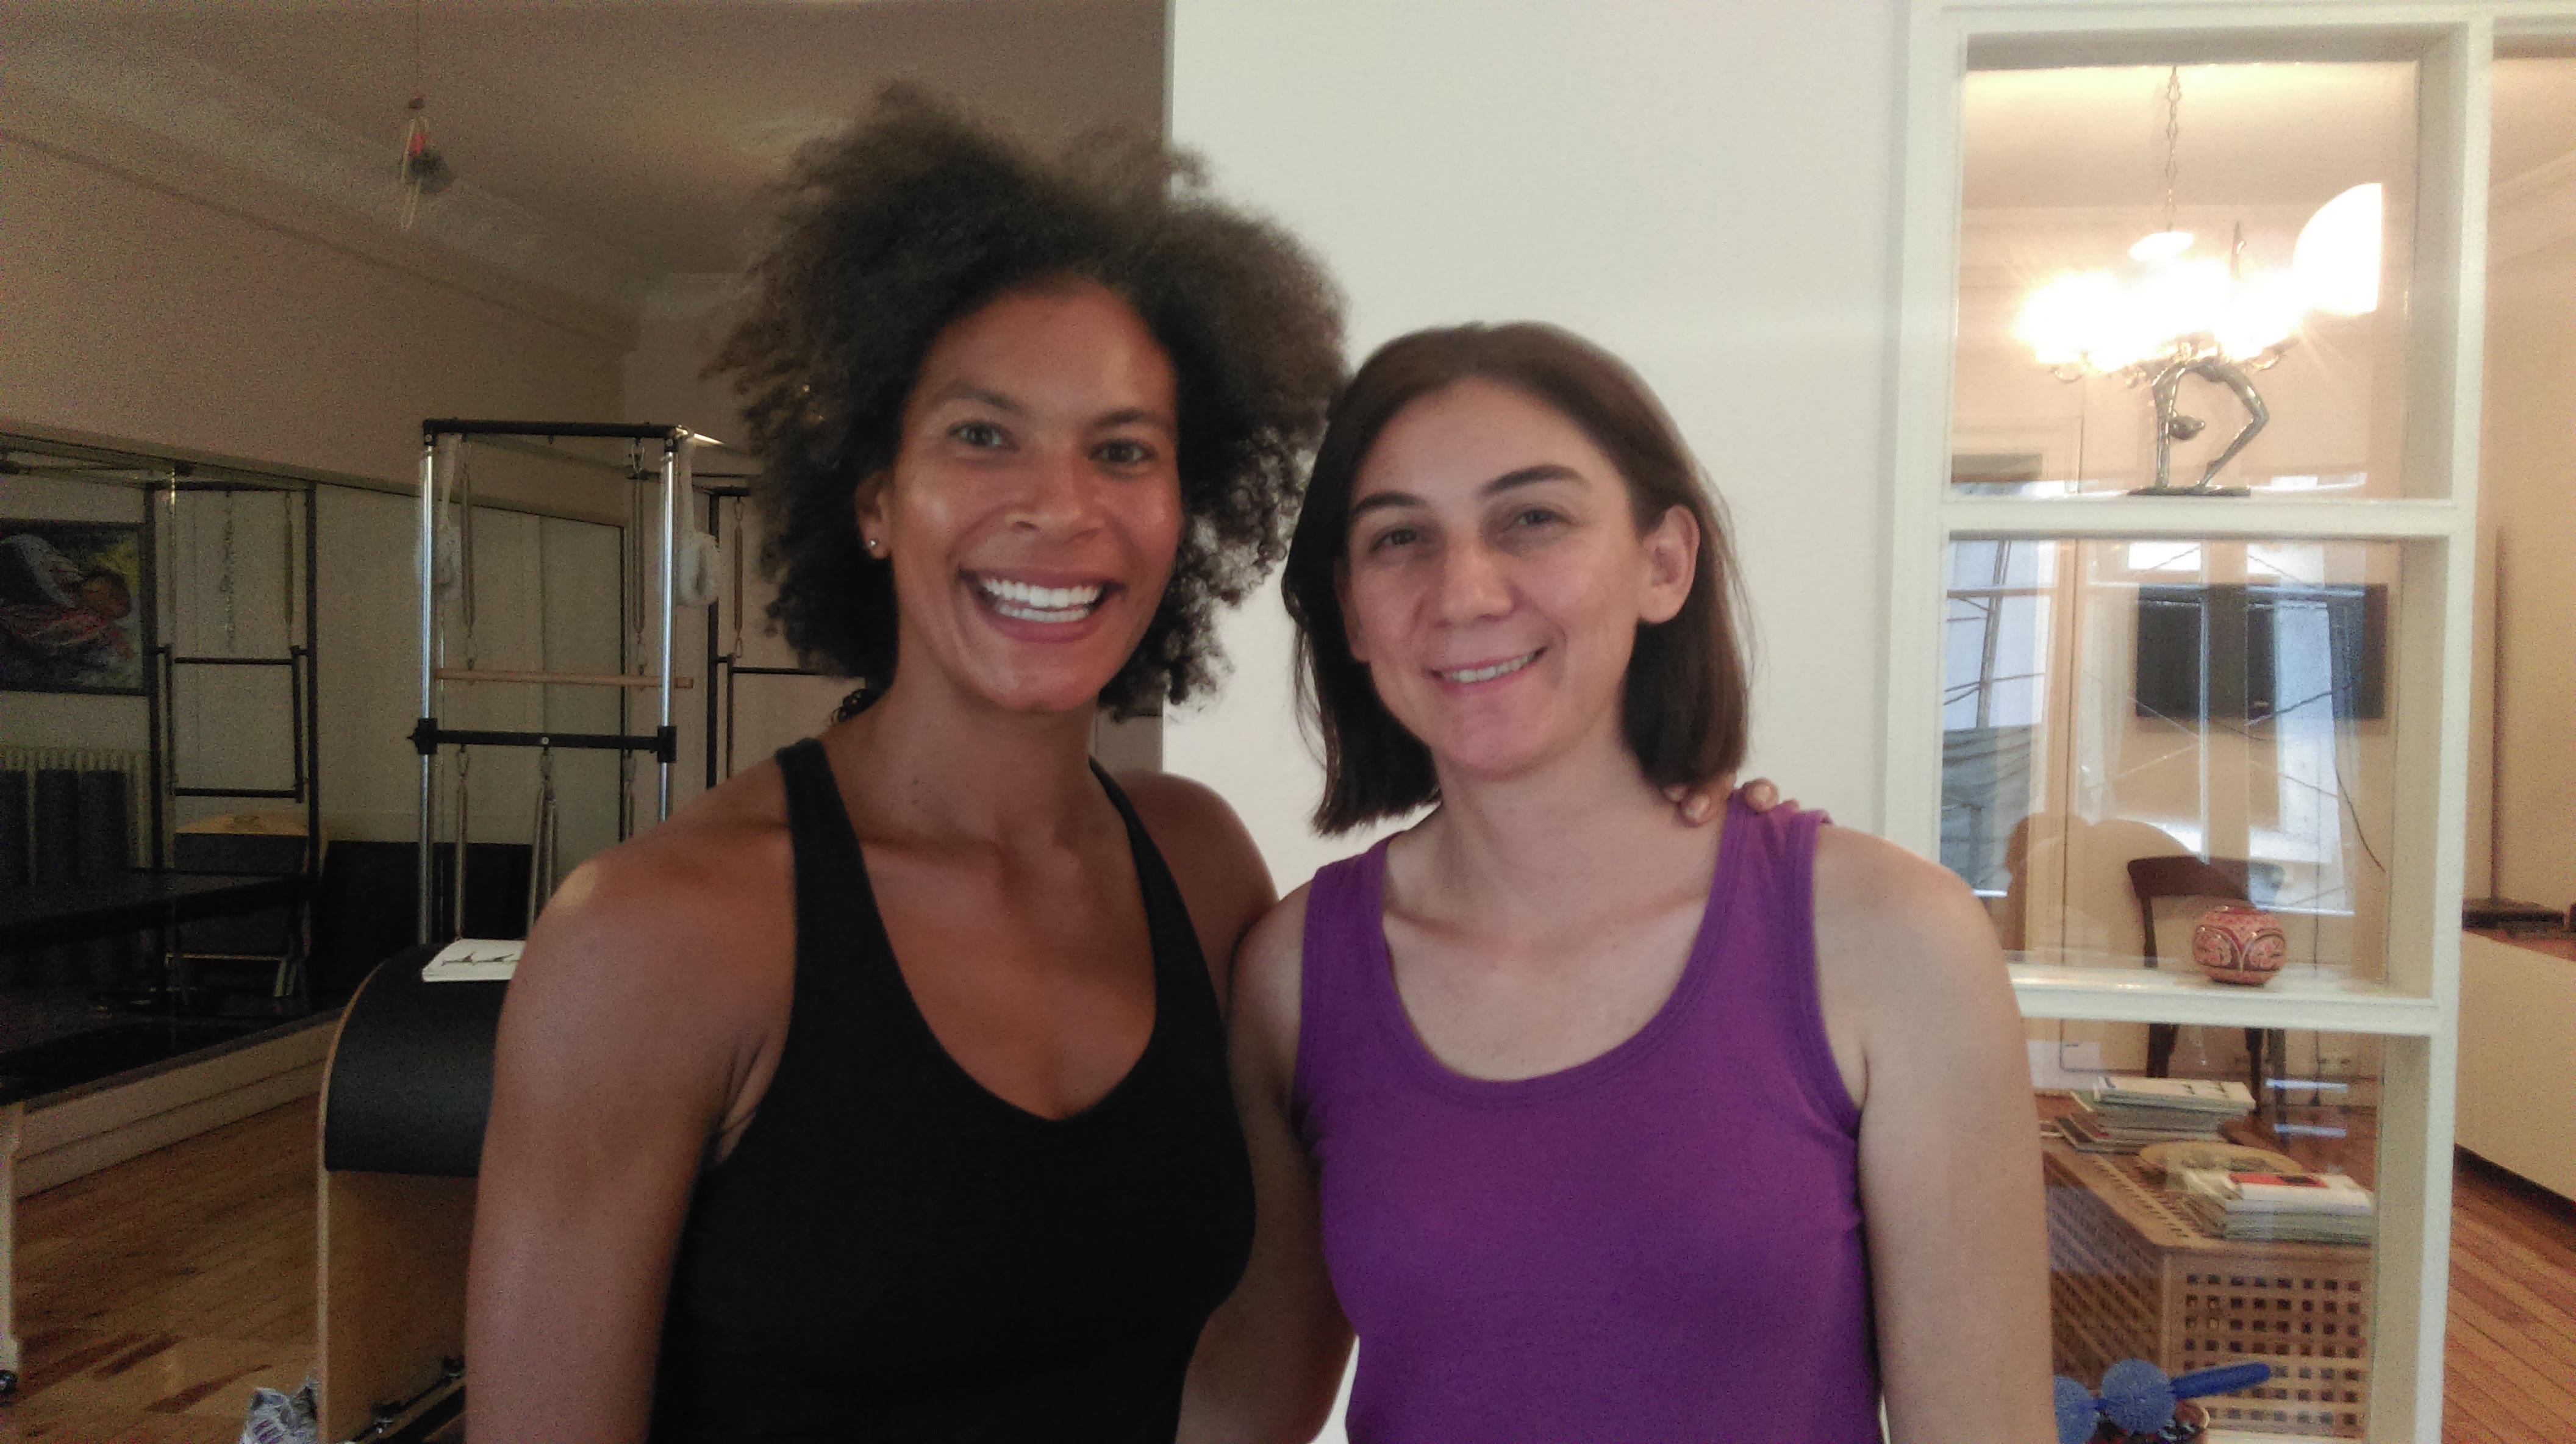 Stott Pilates Master Jennifer Dahl